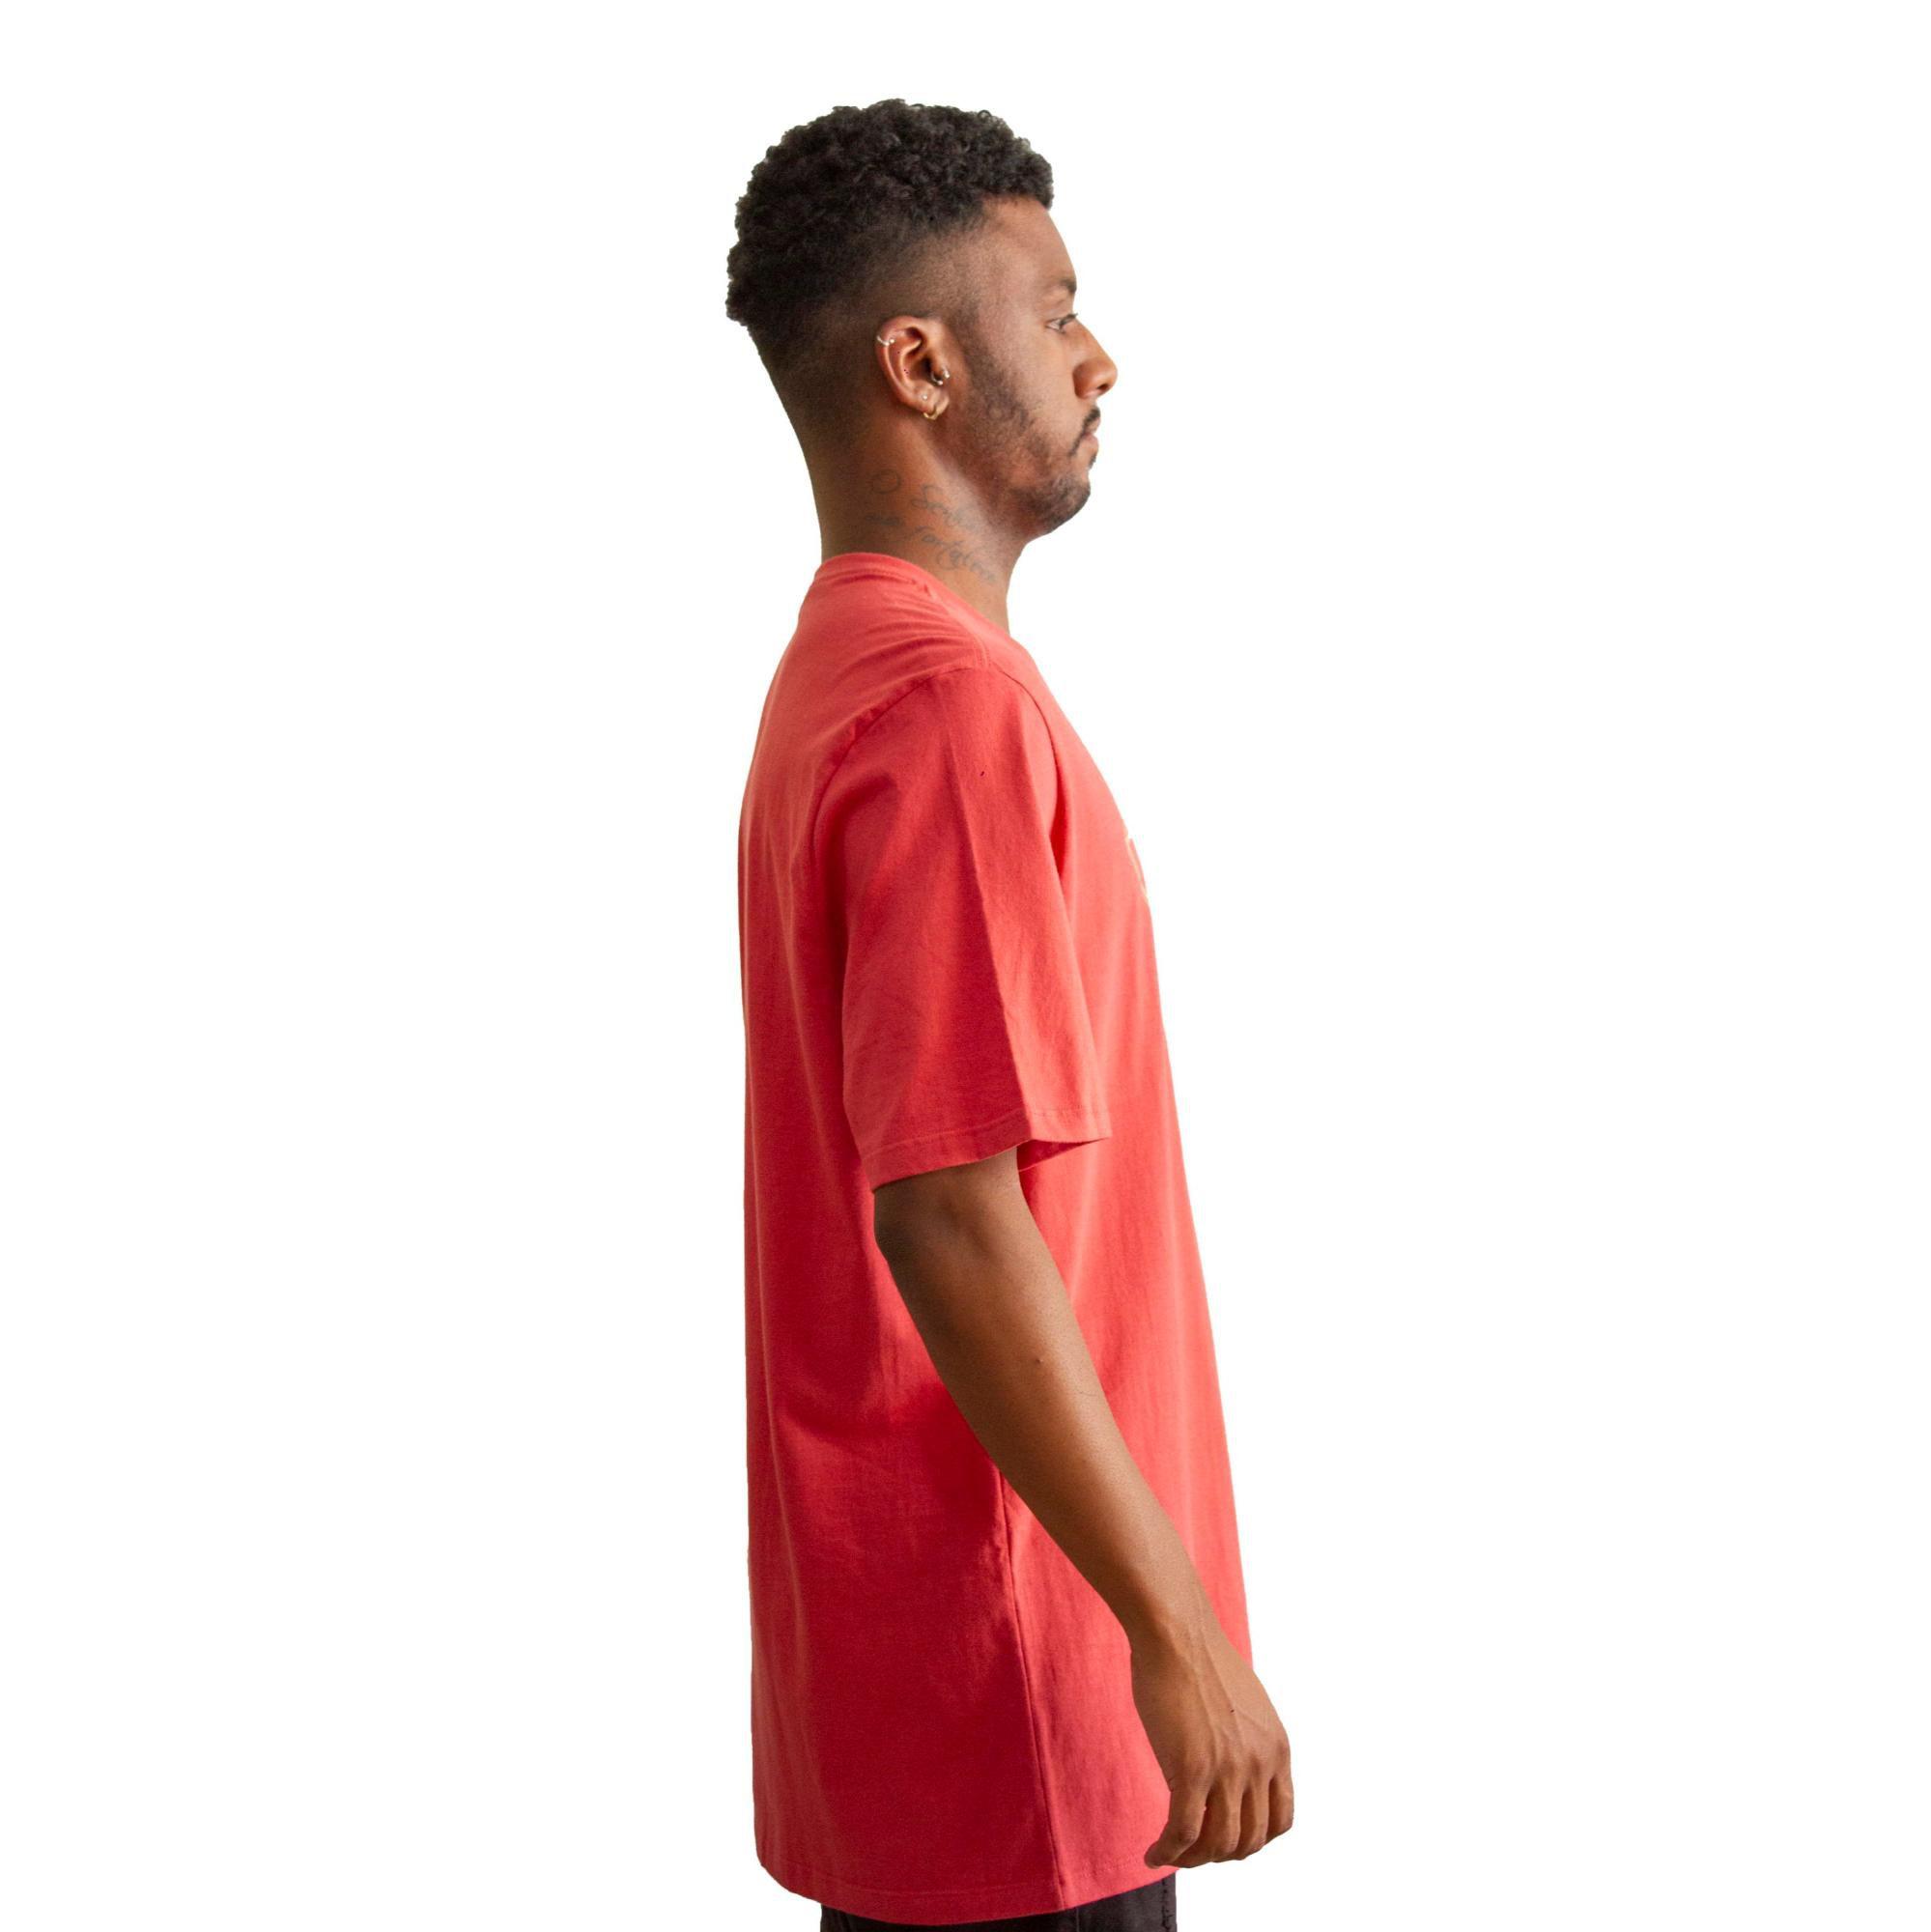 Camiseta WG Vermelha